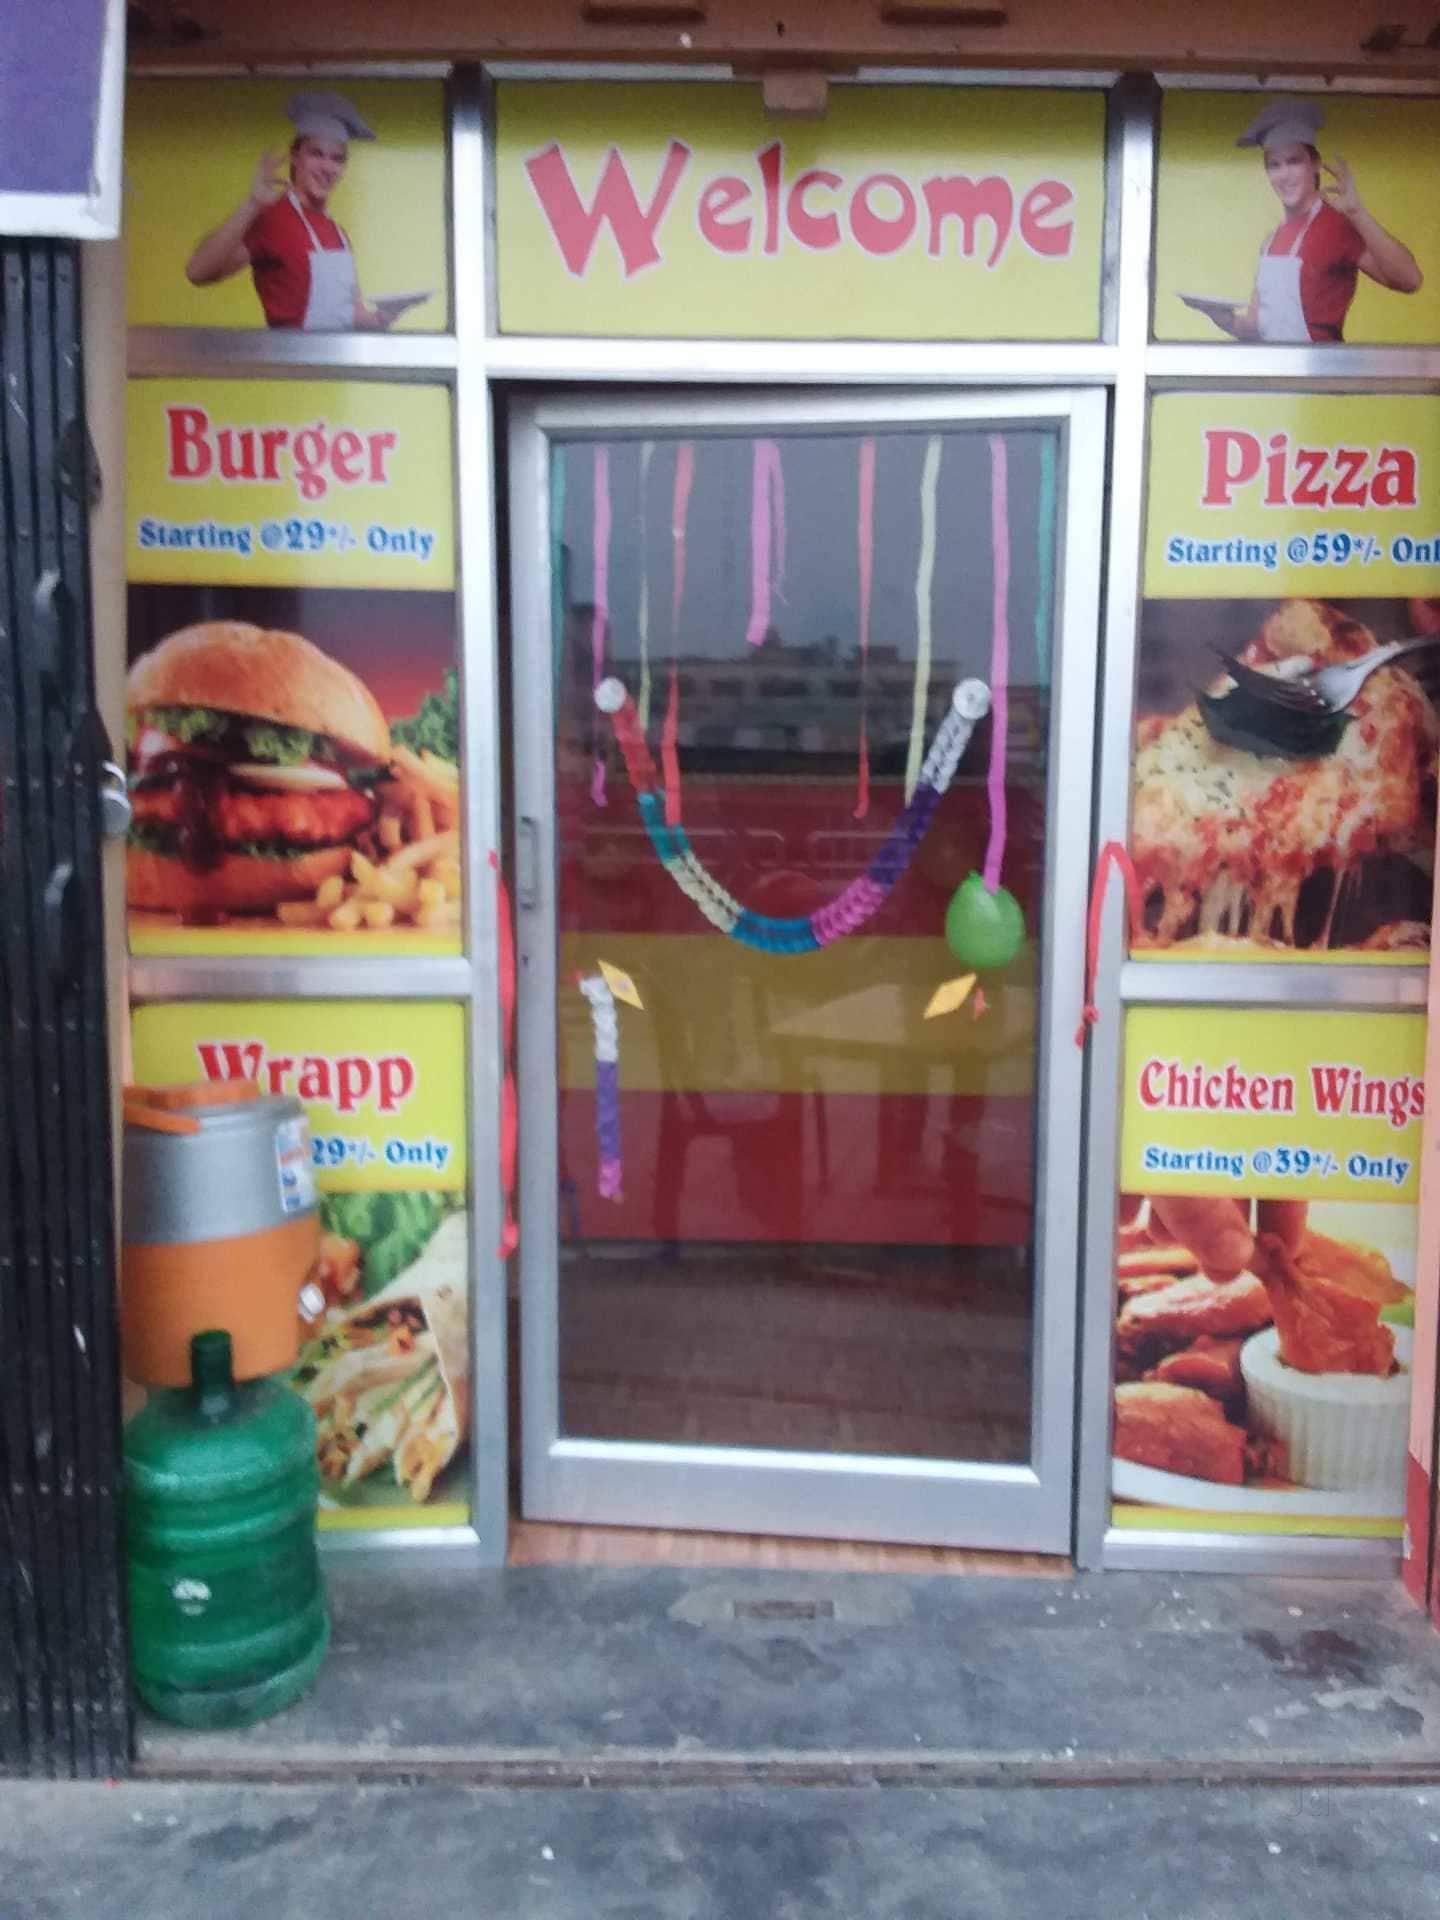 Pizza Outlets in Rani Ki Sarai, Azamgarh - Pizza Restaurants